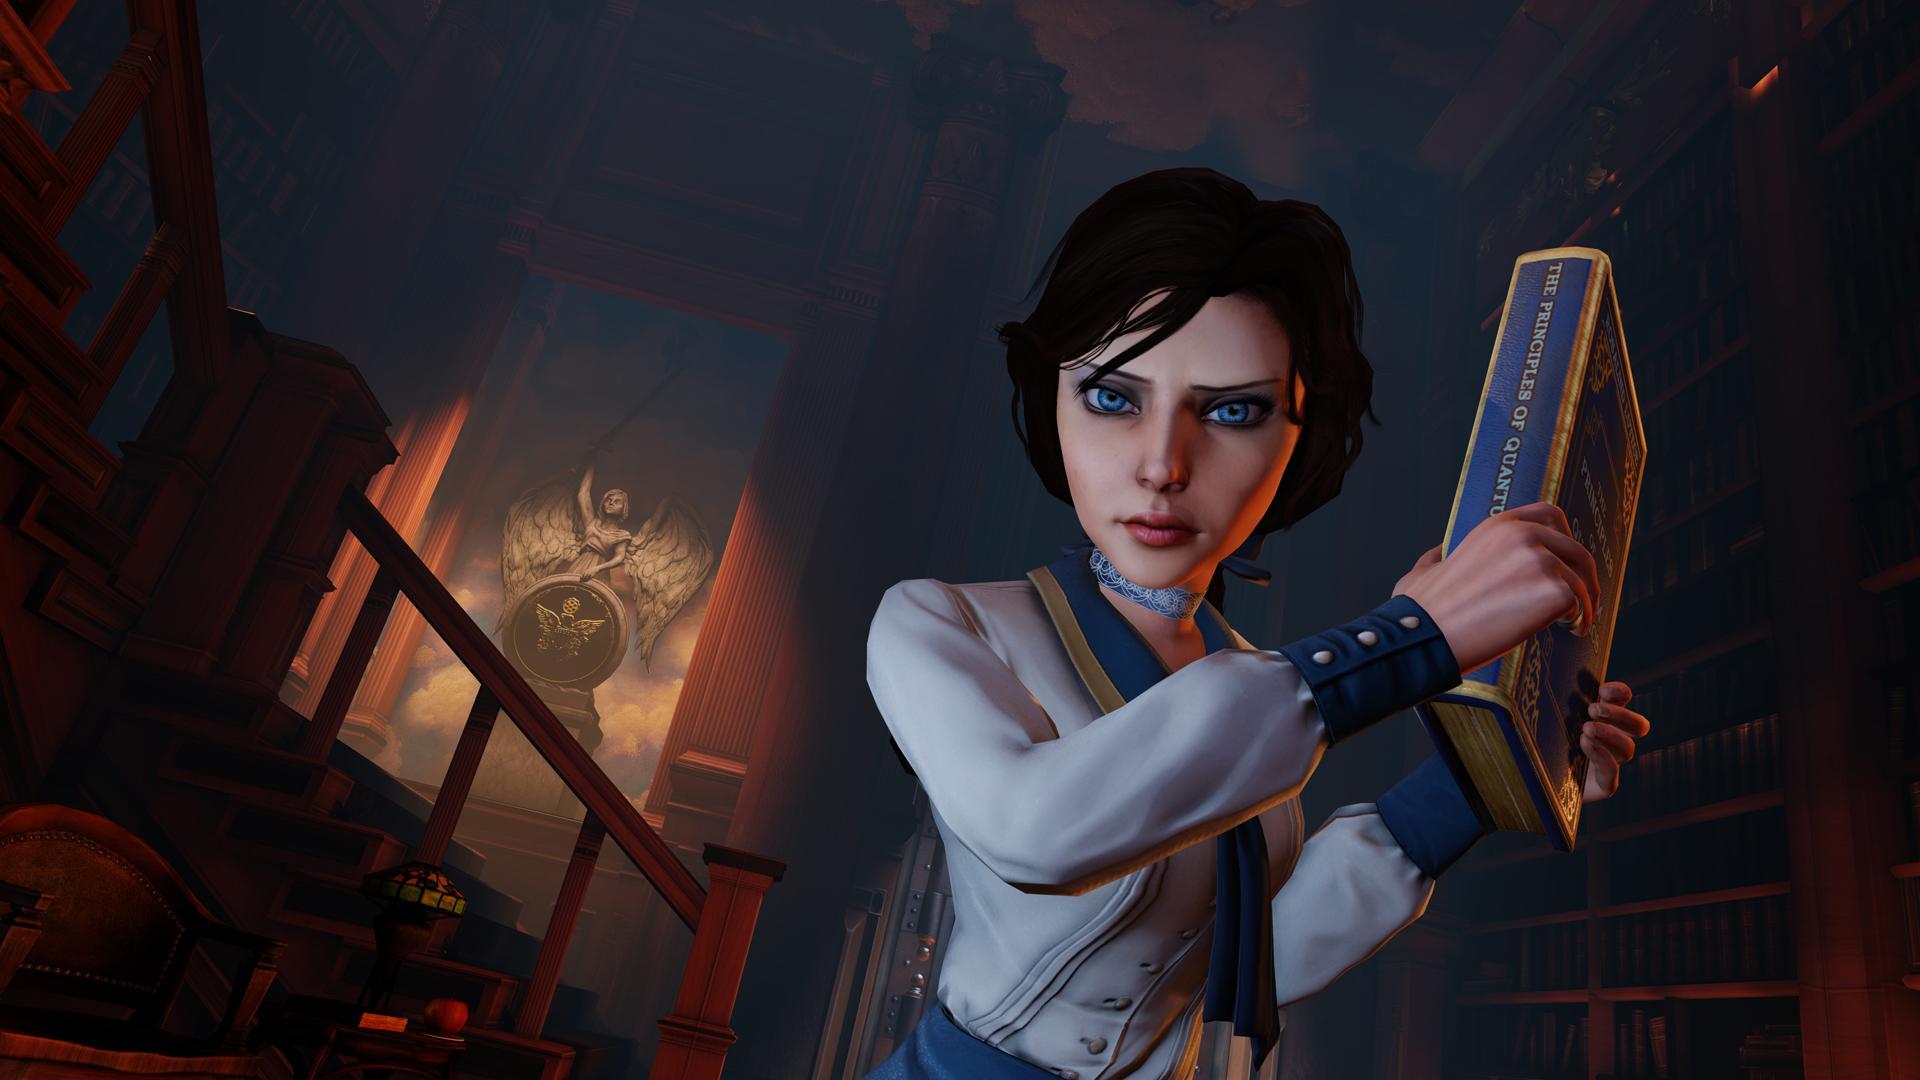 BioShock Infinite Review - Xbox 360 Version